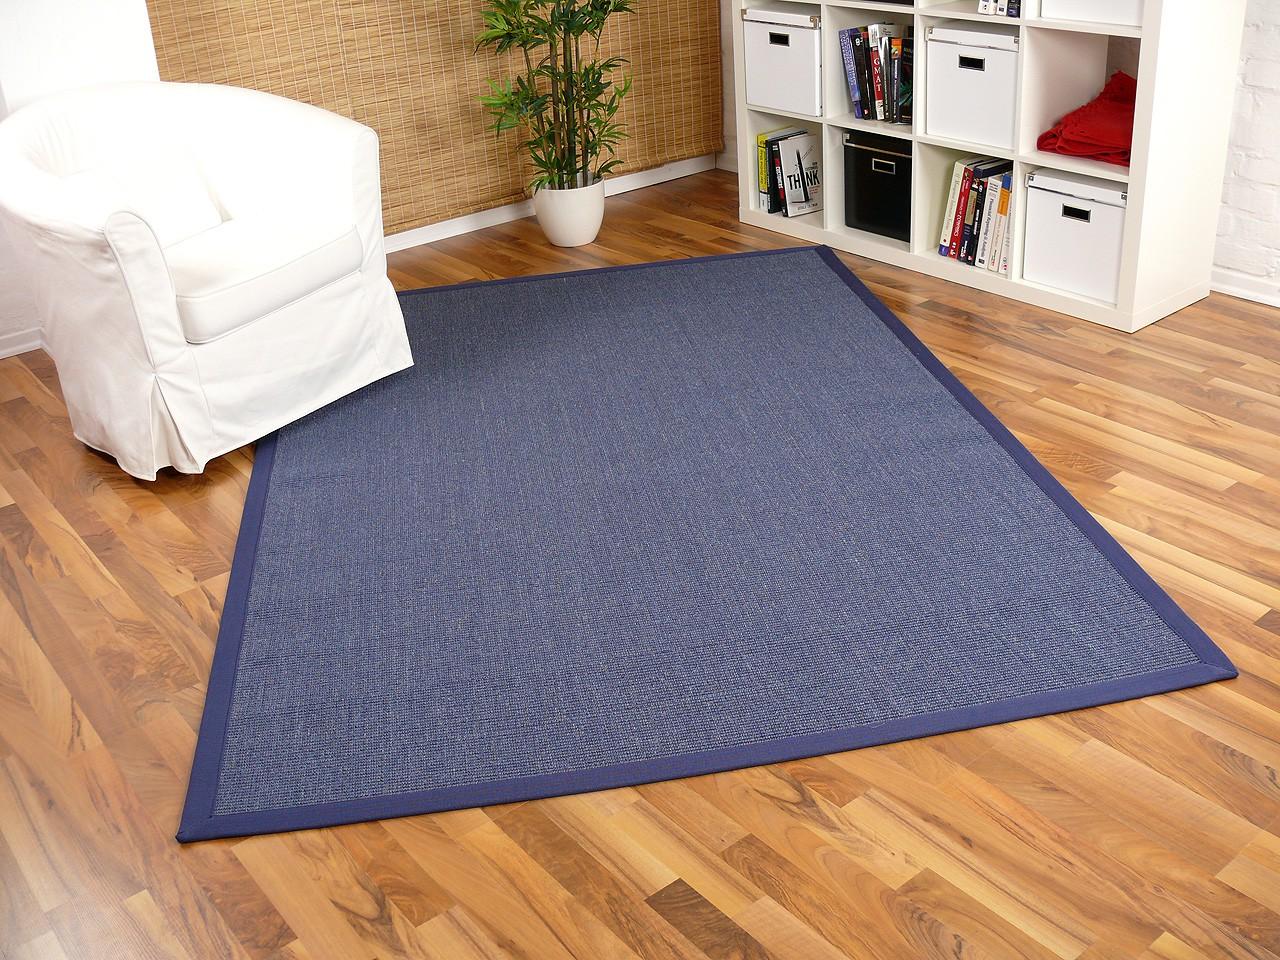 sisal astra natur teppich blau bord re blau teppiche sisal und naturteppiche sisal teppiche mit. Black Bedroom Furniture Sets. Home Design Ideas